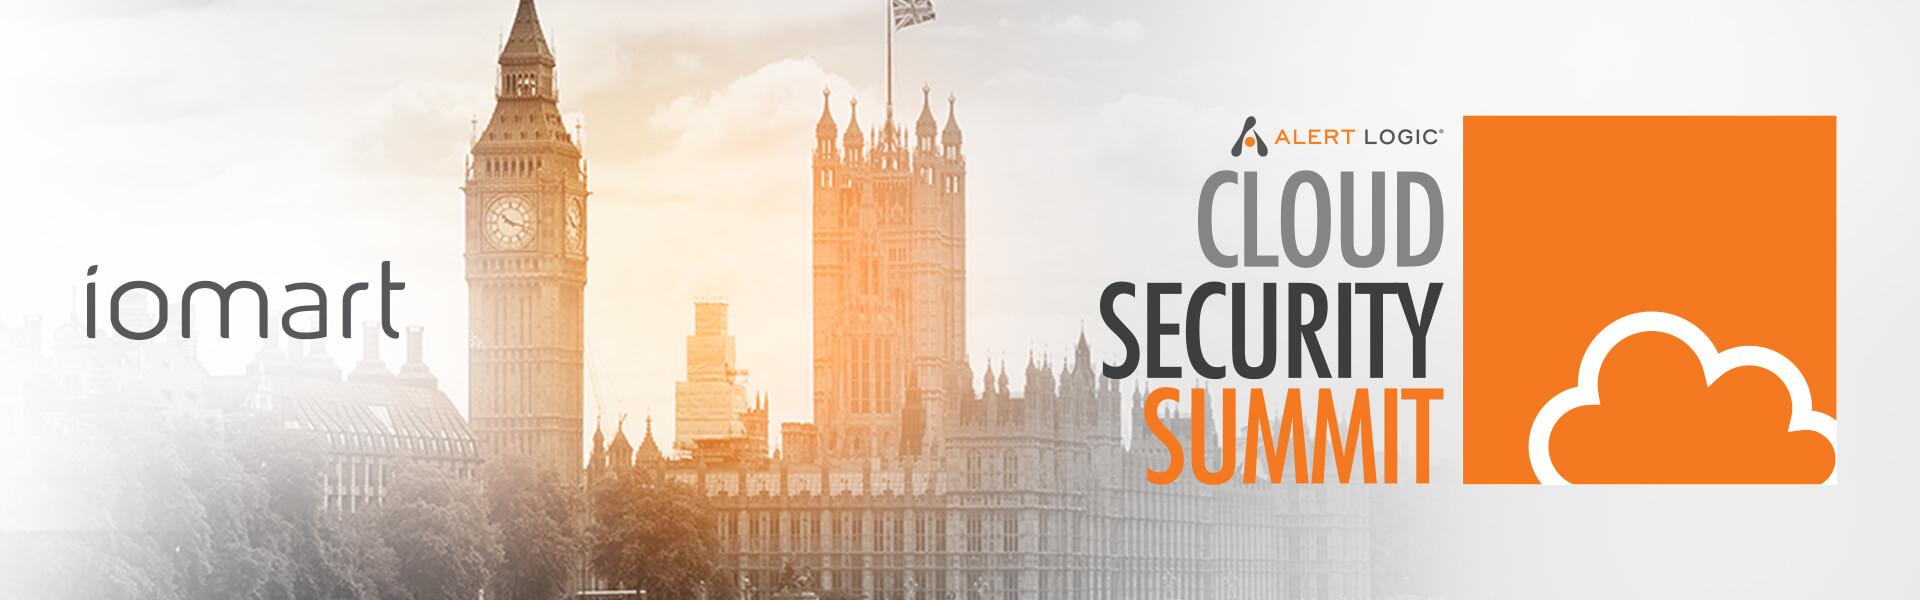 Cloud Security Summit logo